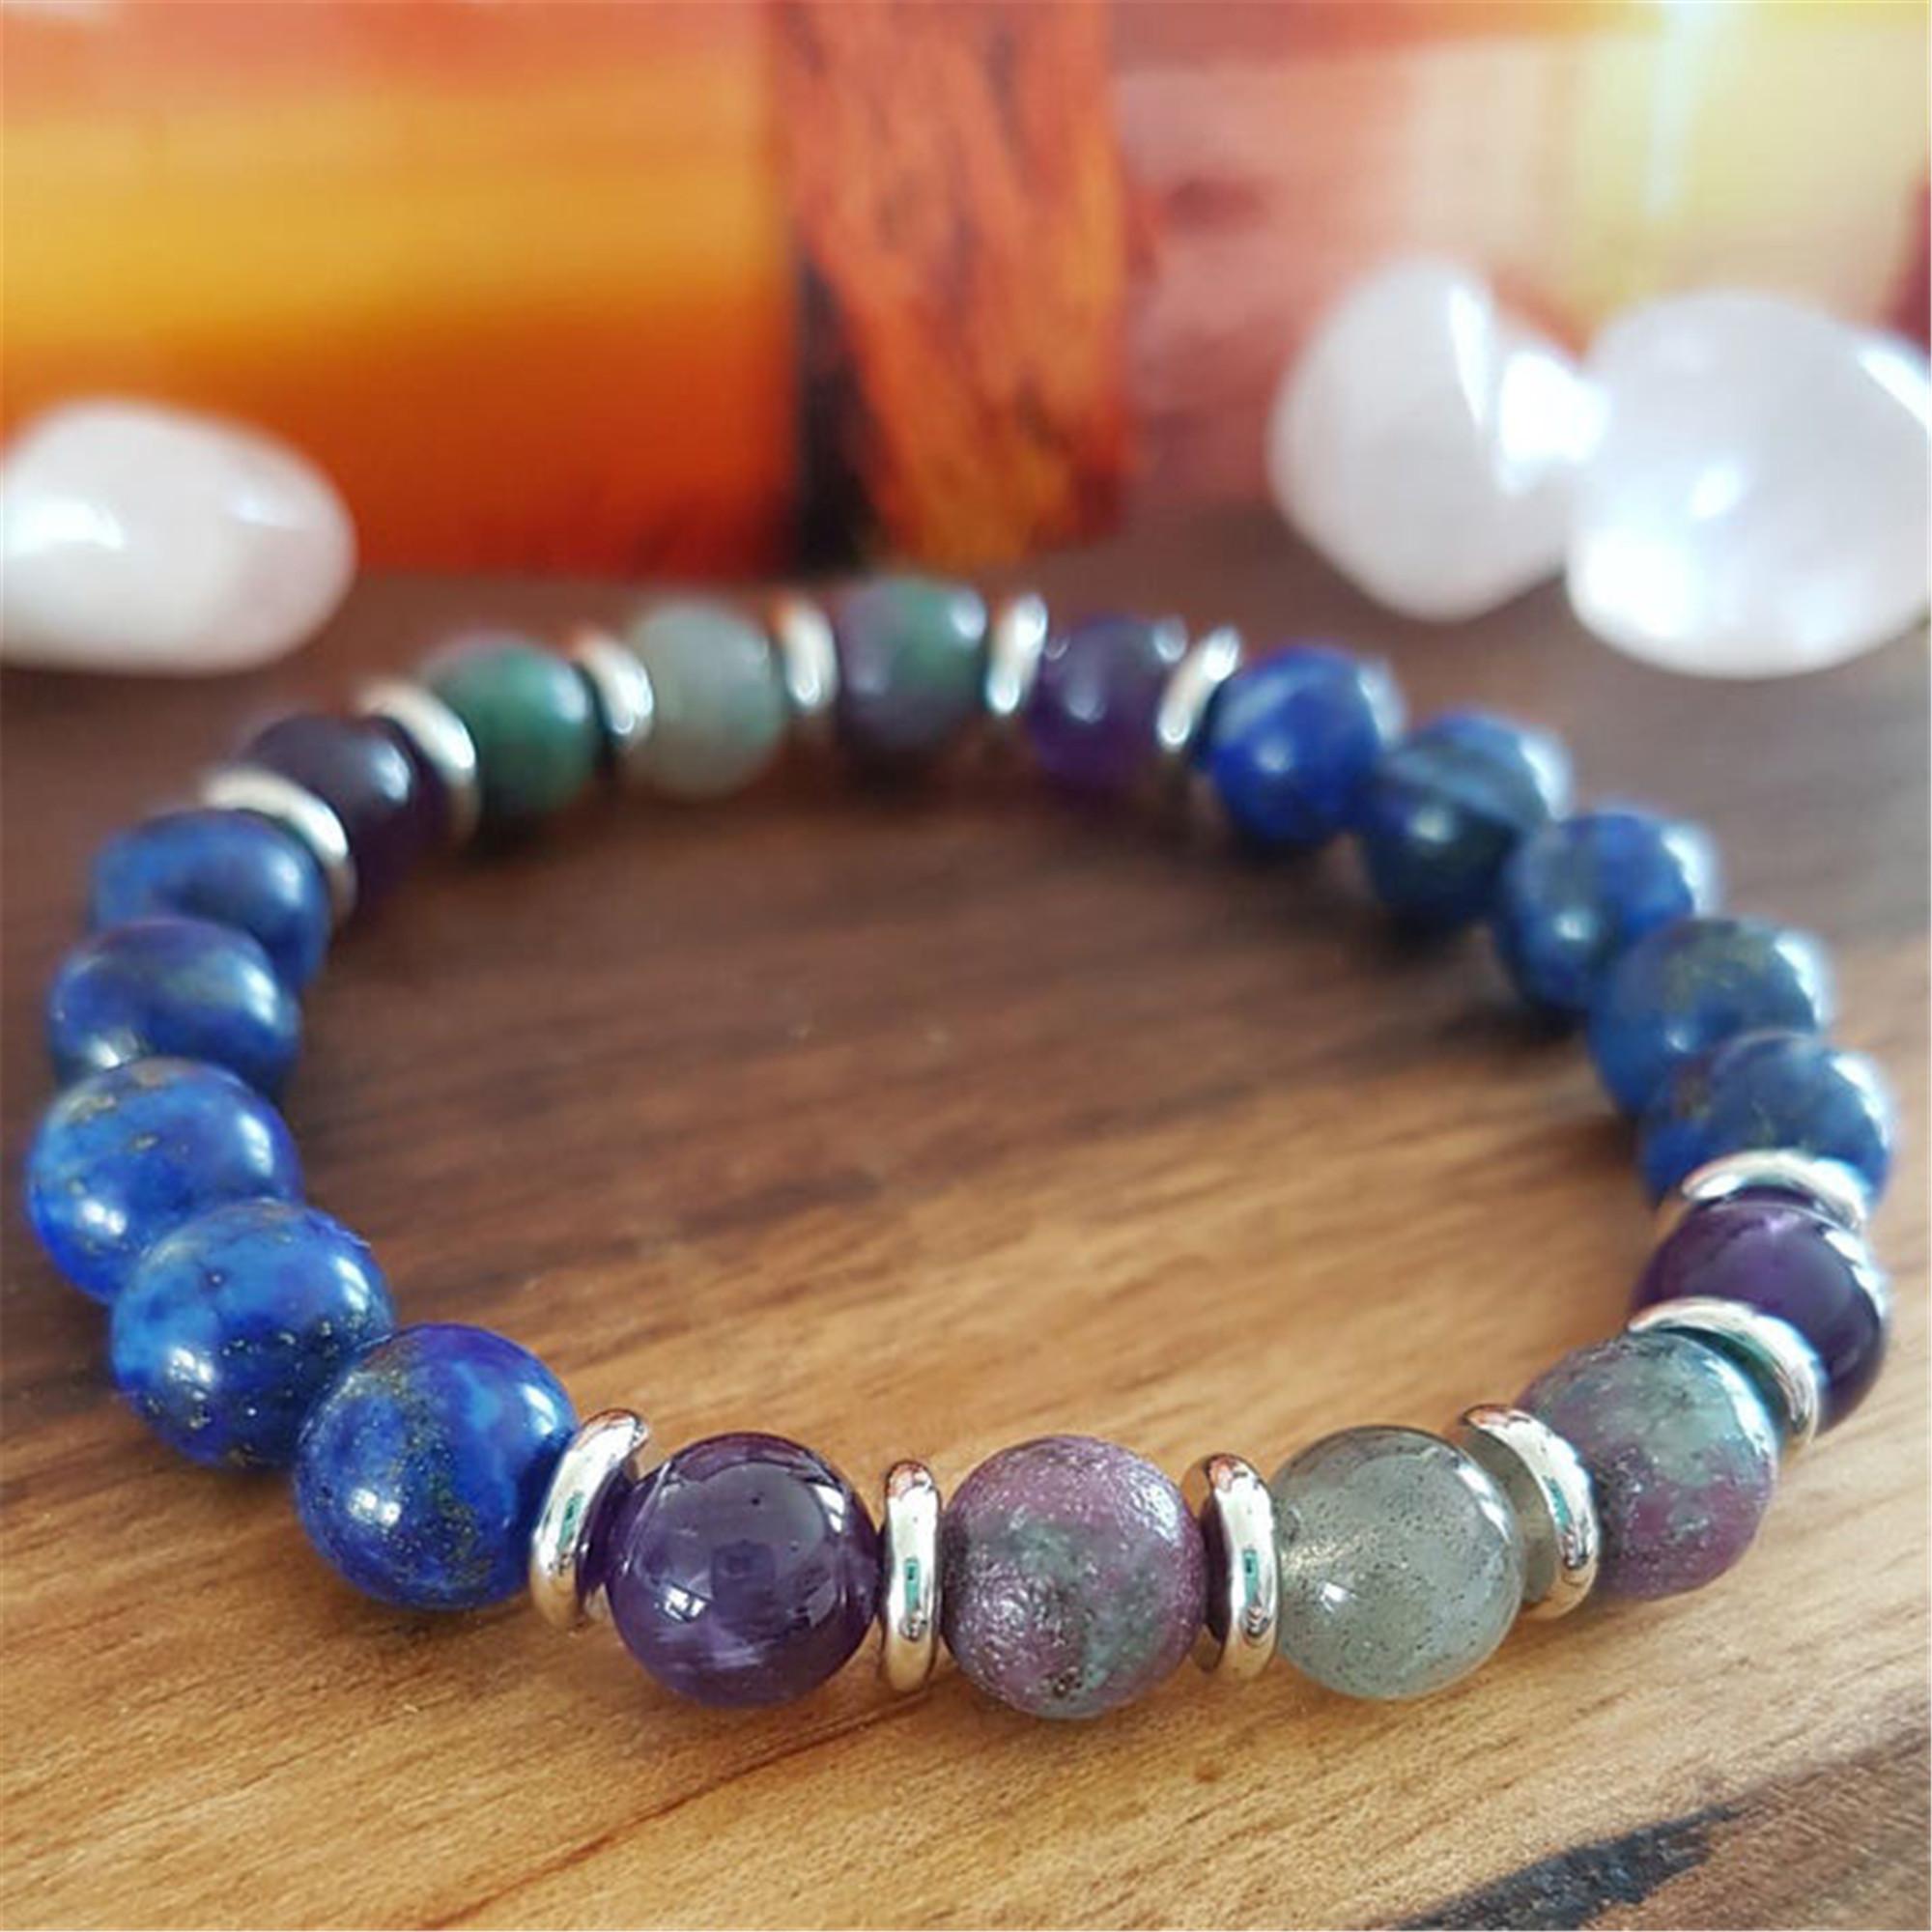 8mm Lapis lazuli Bracelet 7.5 inches Wrist Cuff Spirituality Mala Bead Pray